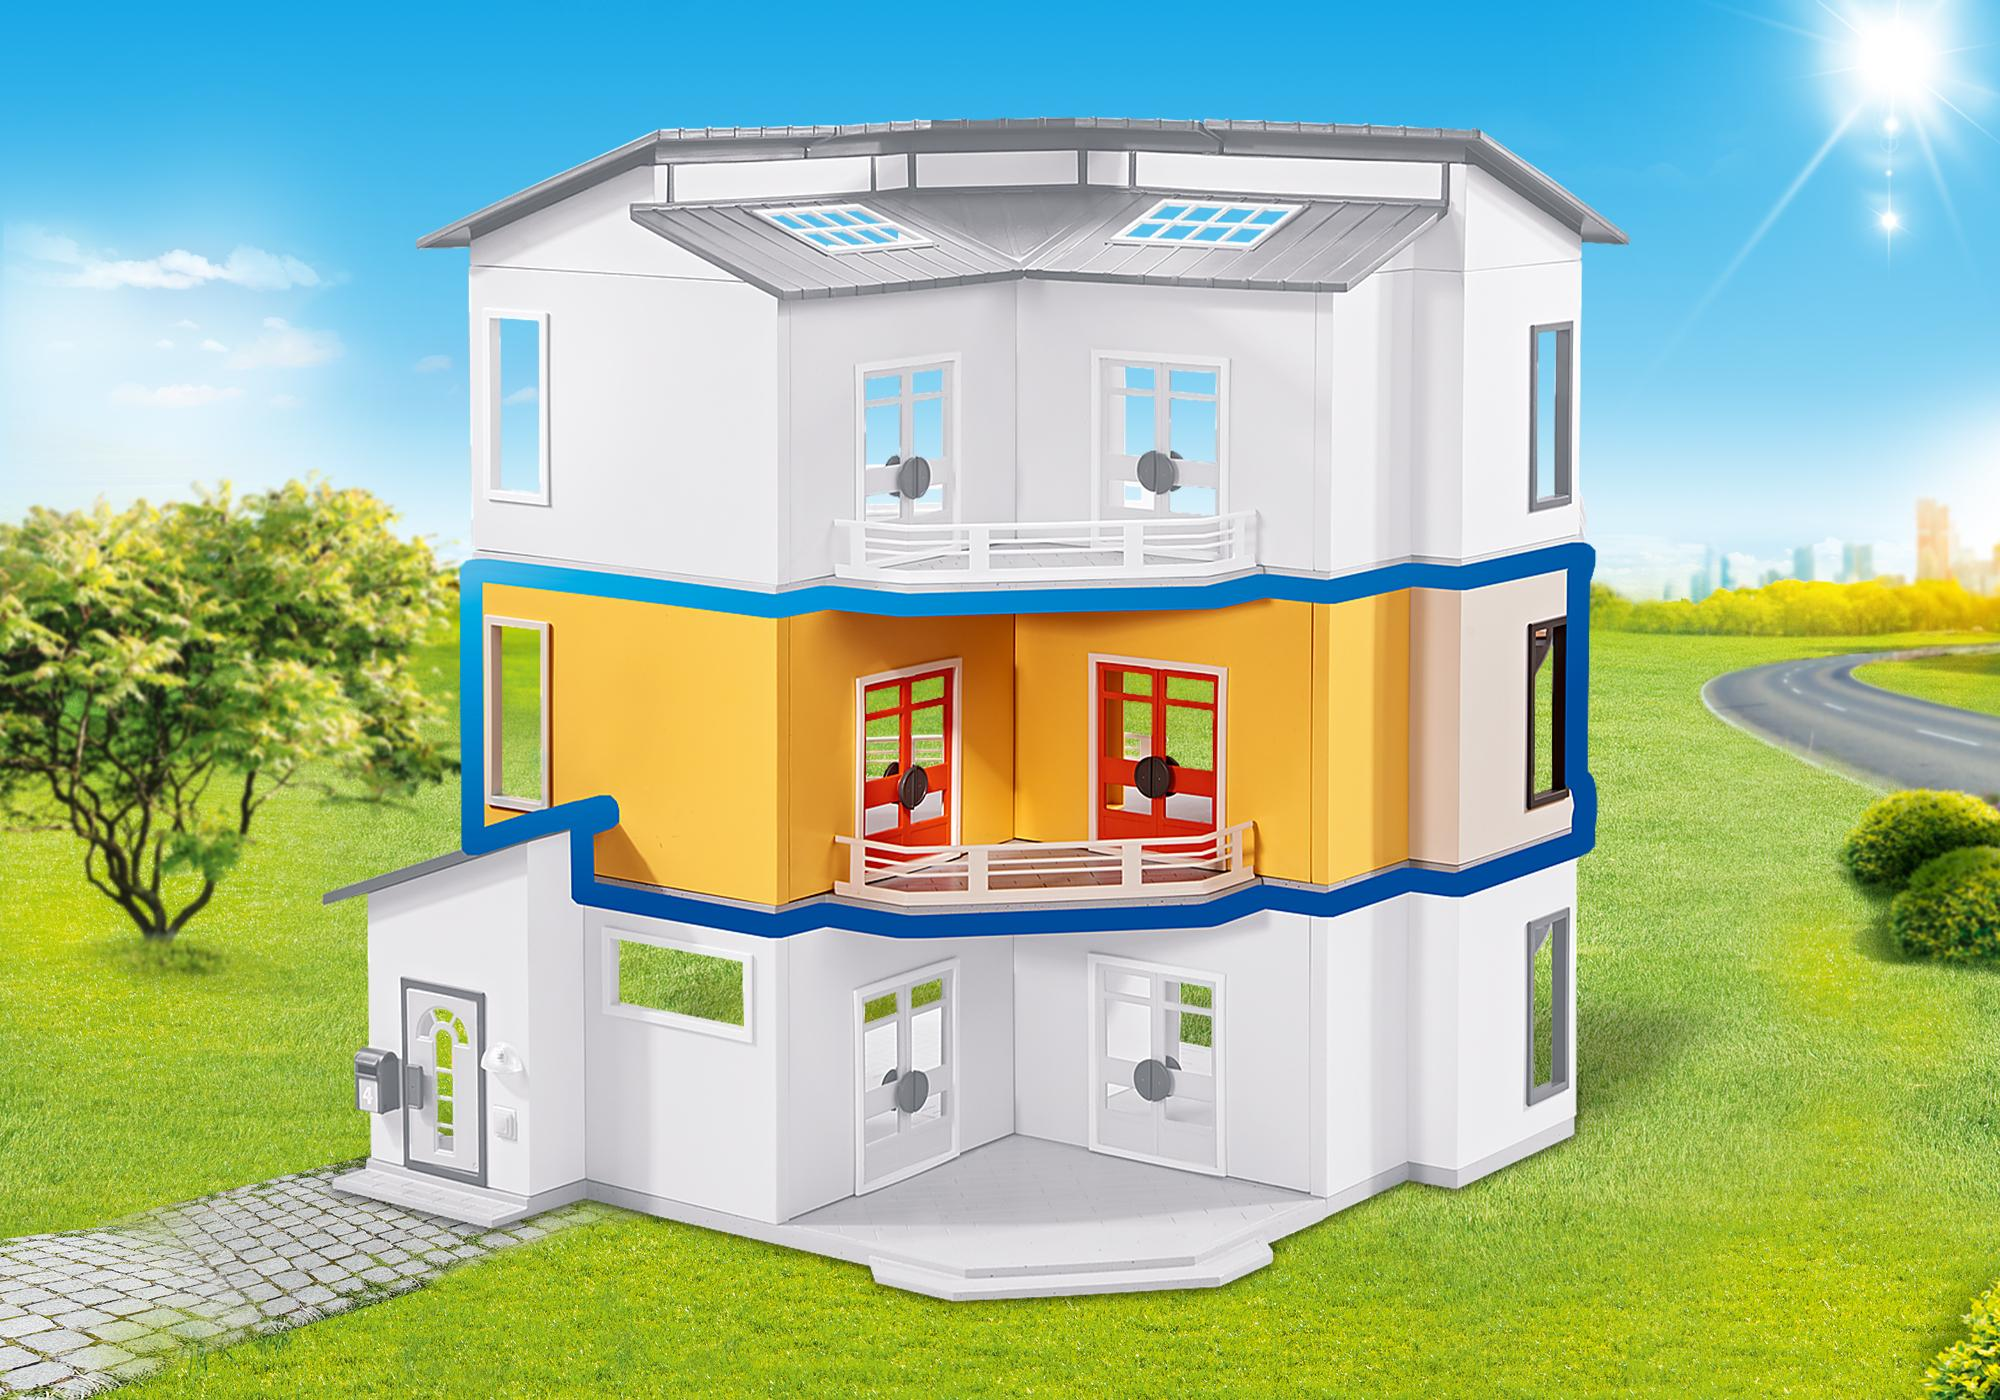 http://media.playmobil.com/i/playmobil/6554_product_detail/Uitbreiding voor het Modern Woonhuis (art.9266)